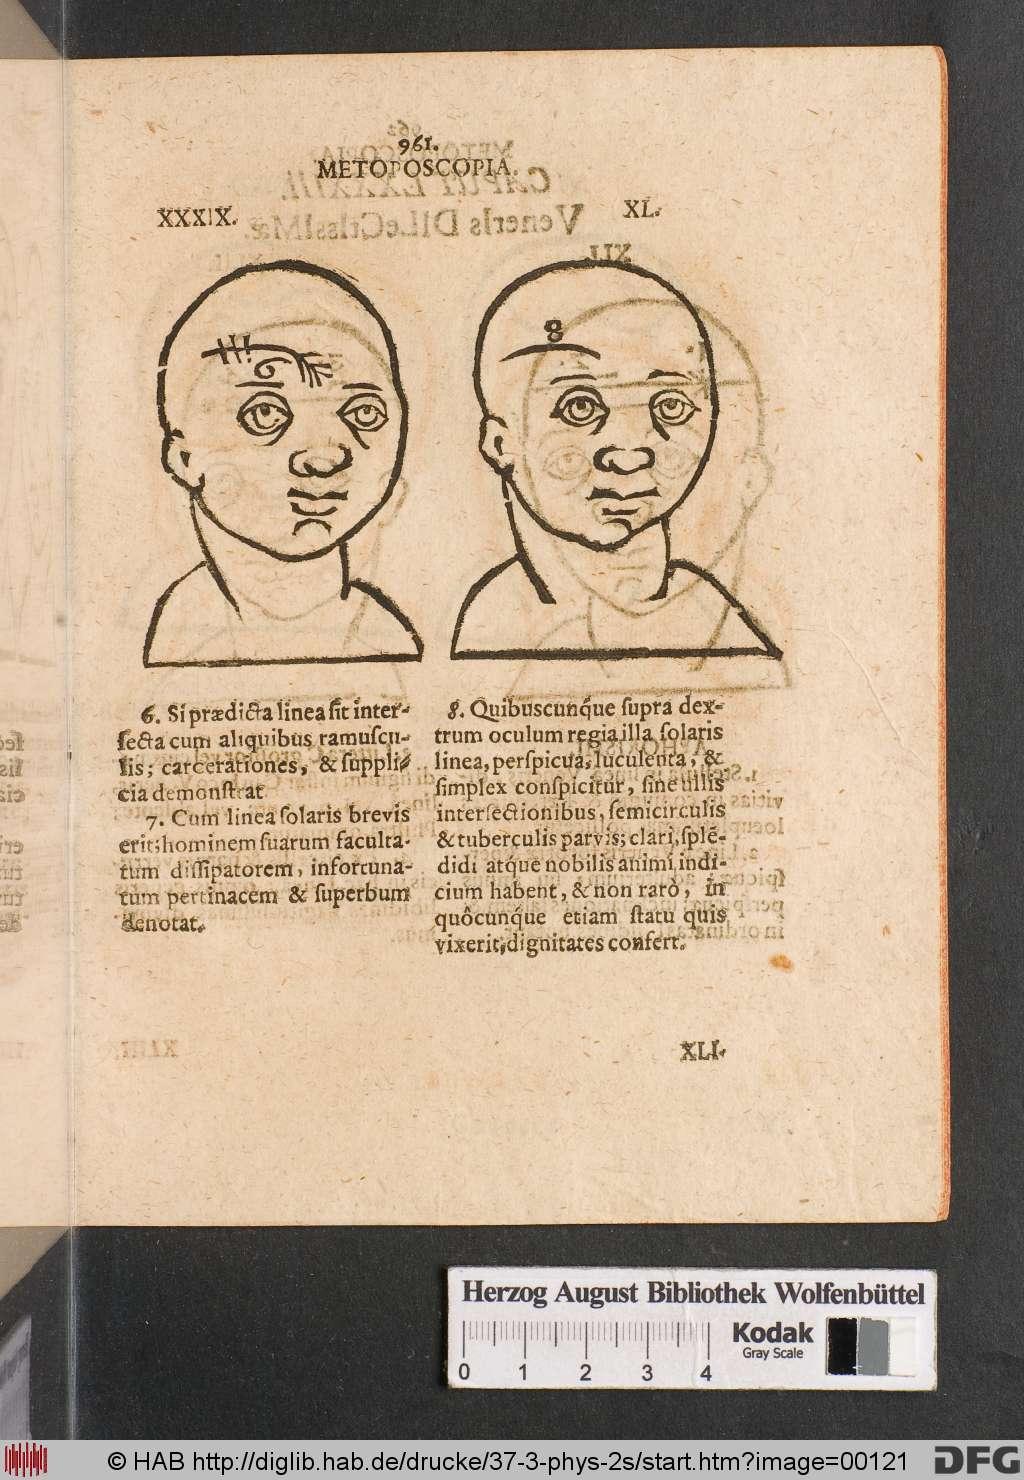 http://diglib.hab.de/drucke/37-3-phys-2s/00121.jpg